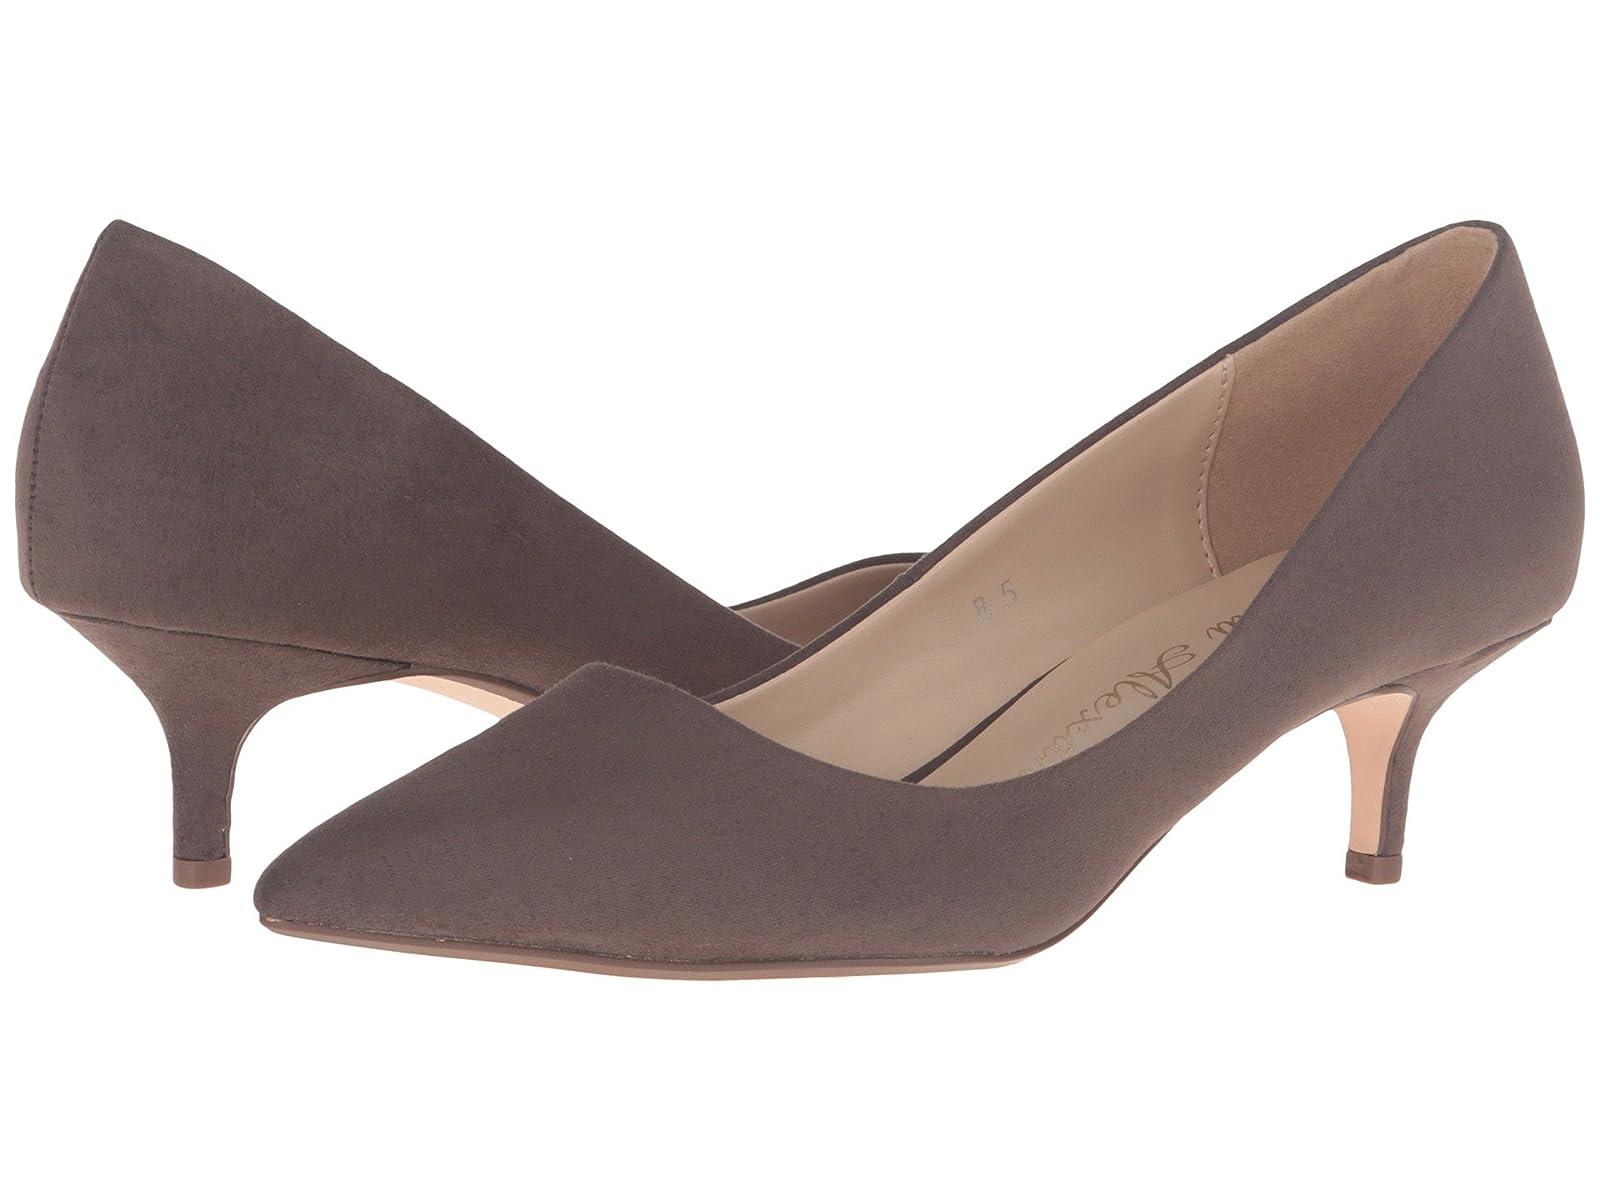 Athena Alexander TeagueCheap and distinctive eye-catching shoes